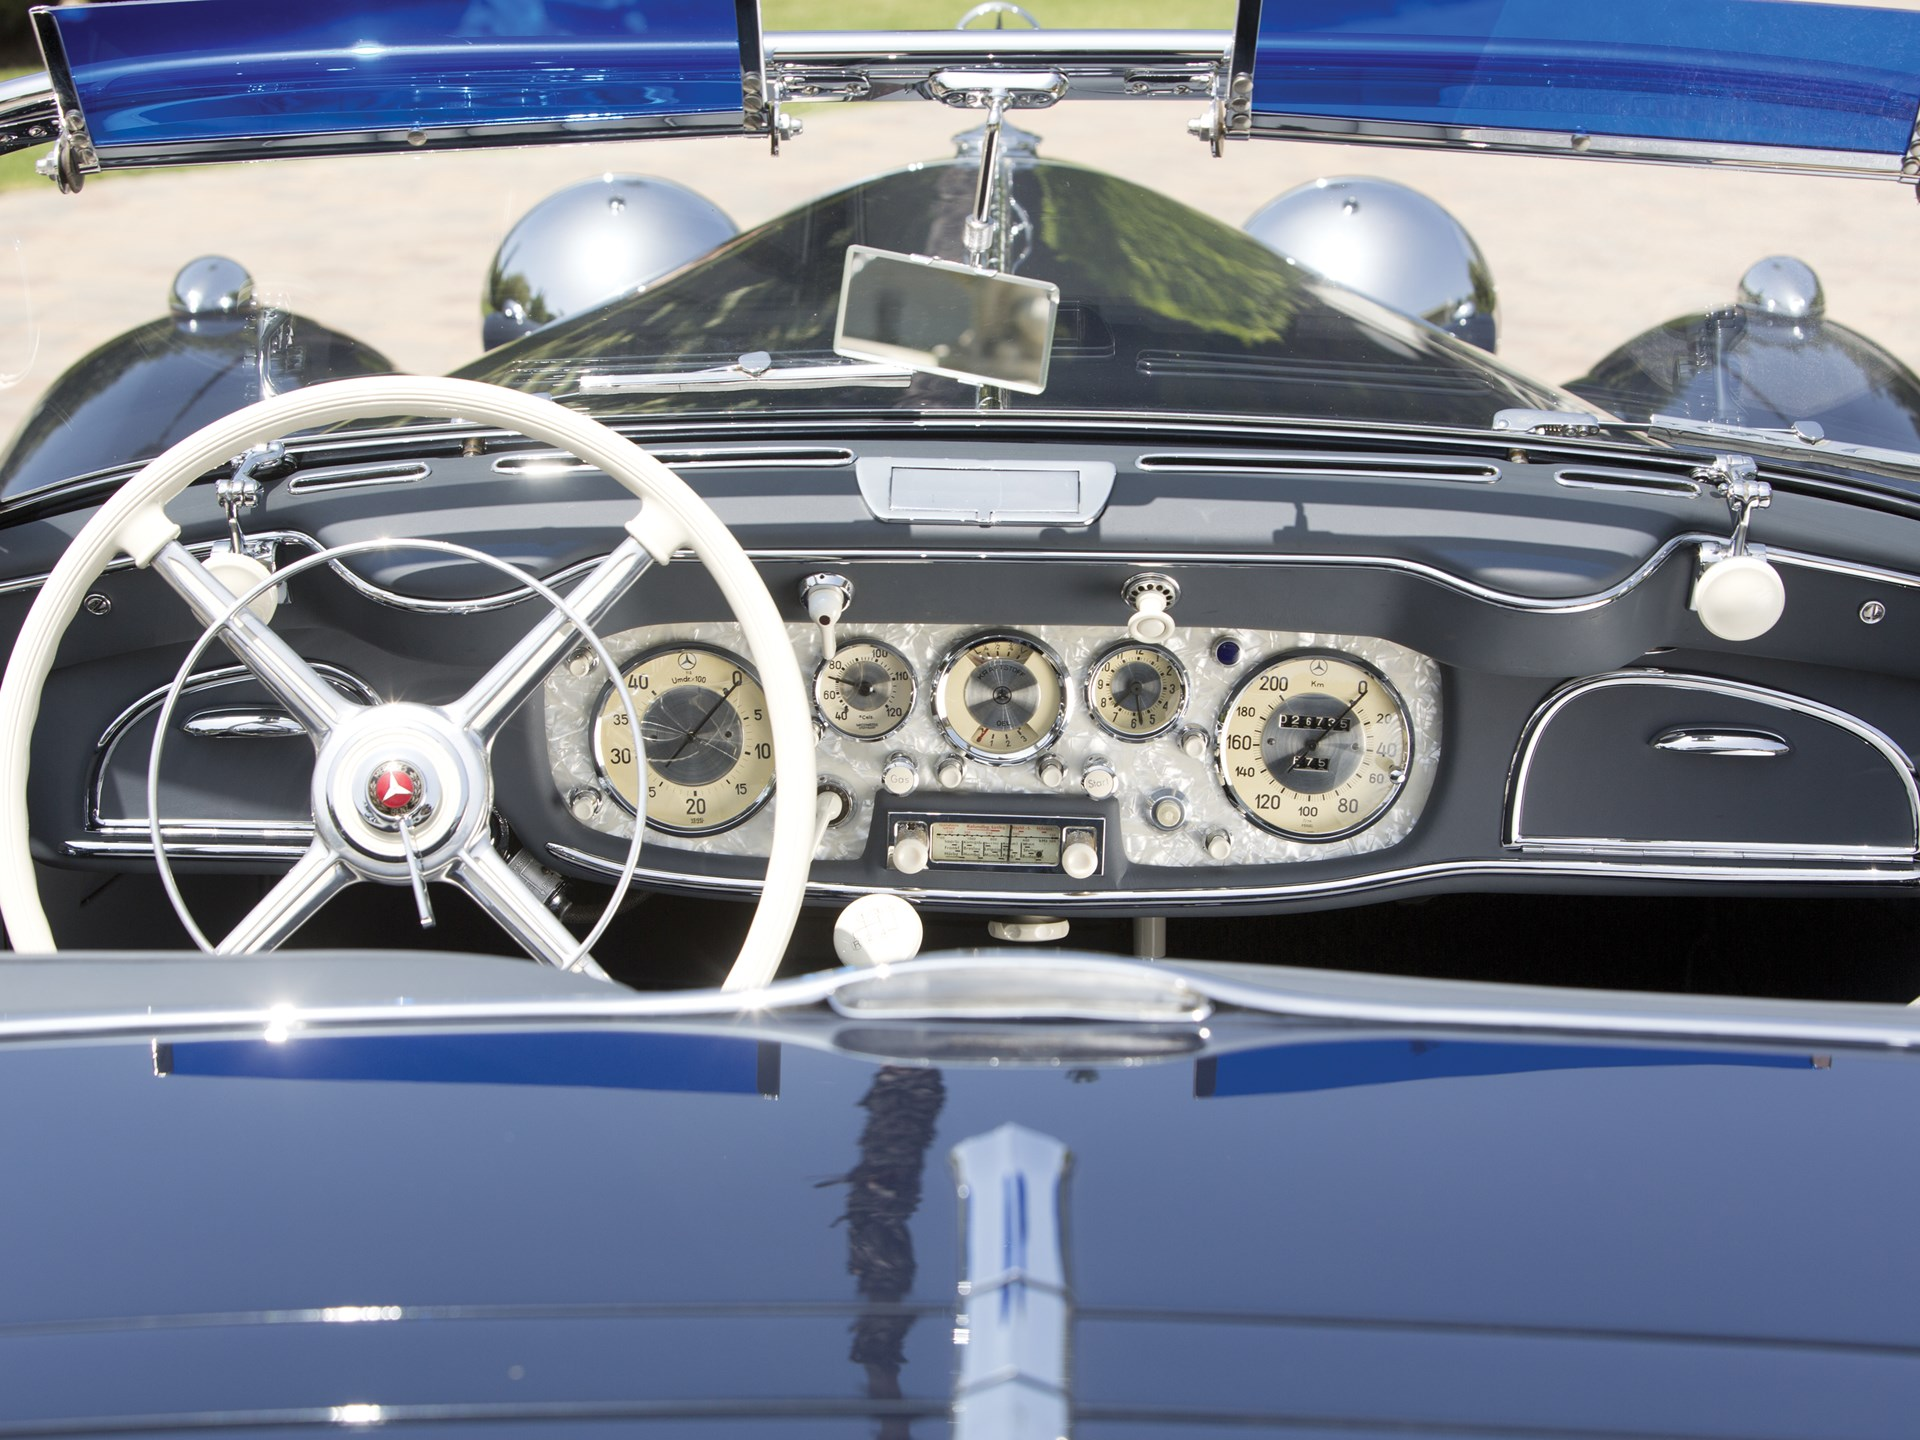 1939 Mercedes-Benz 540k interior gauges